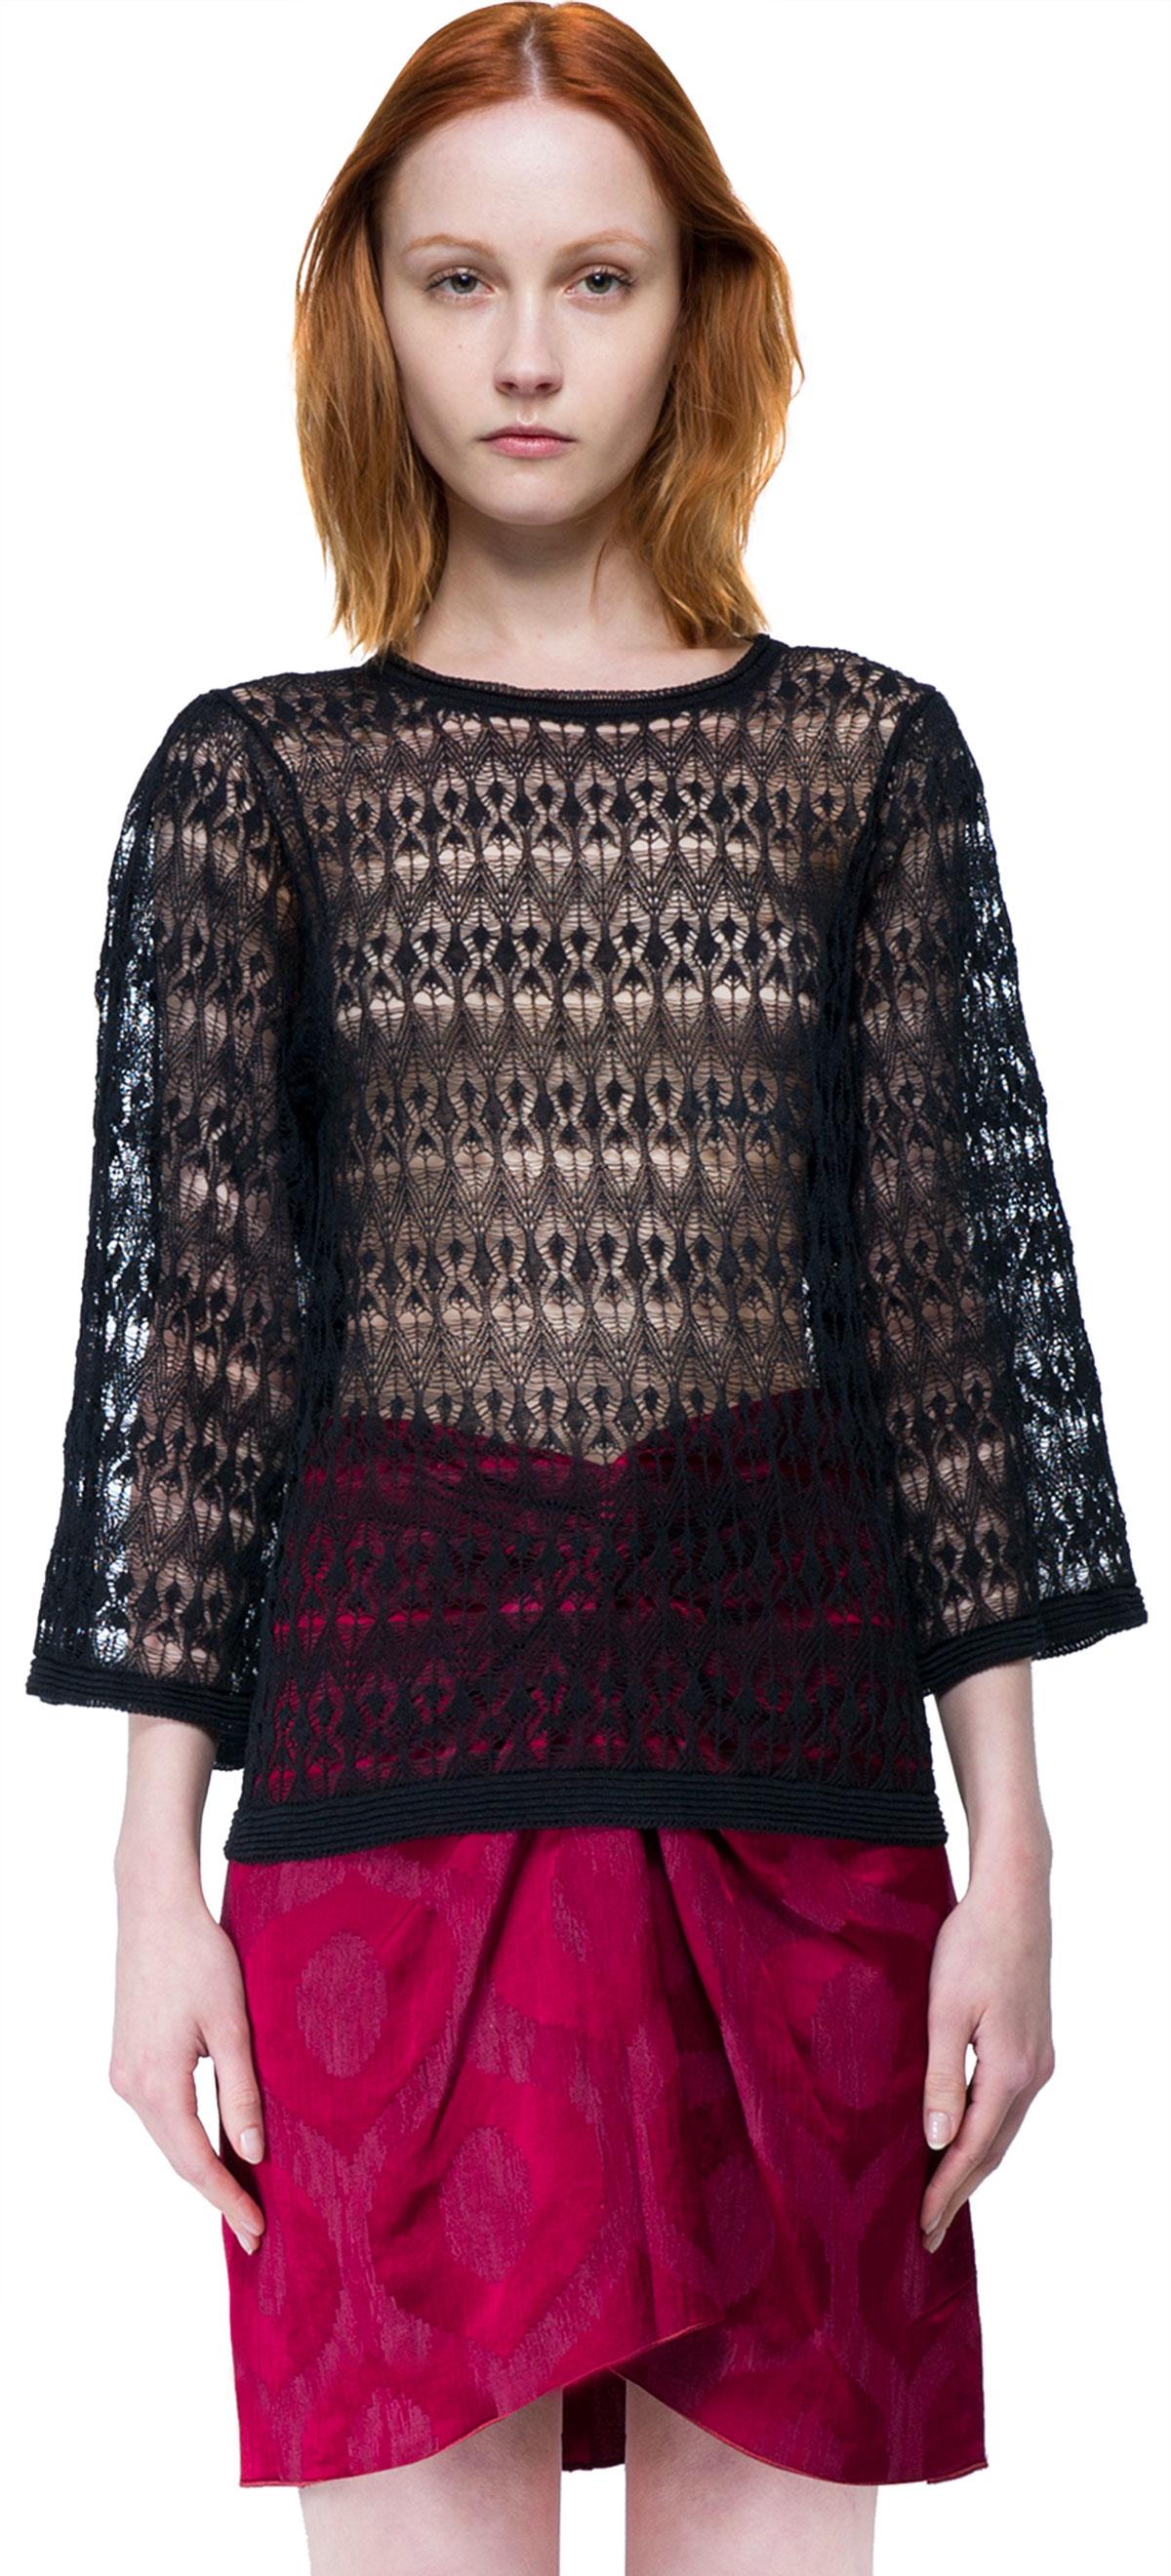 isabel marant lace sweater in floral black plain lyst. Black Bedroom Furniture Sets. Home Design Ideas